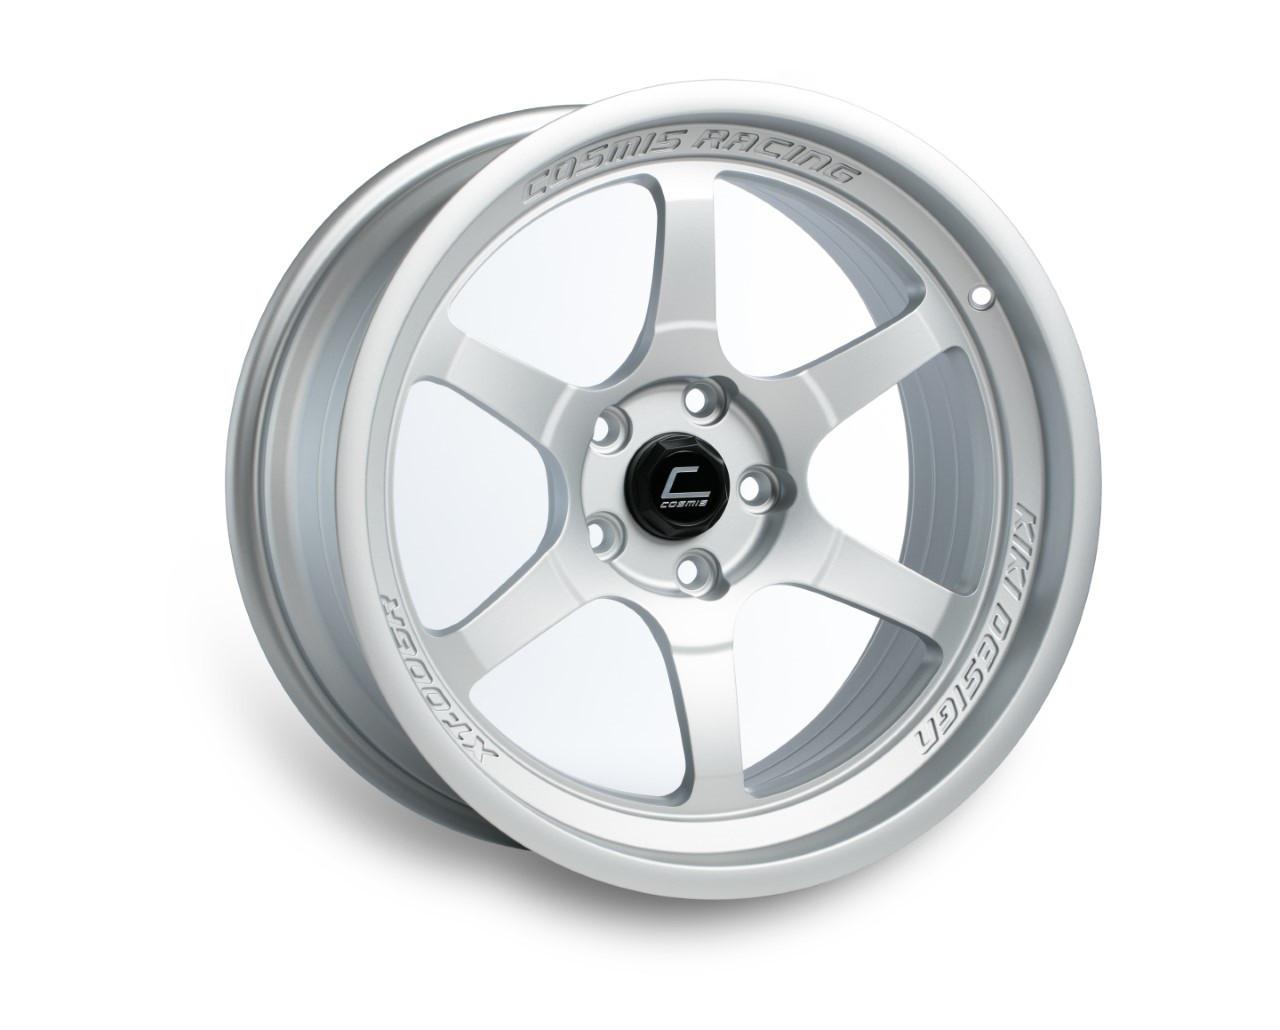 Matte Silver Cosmis Racing XT-006R Wheel